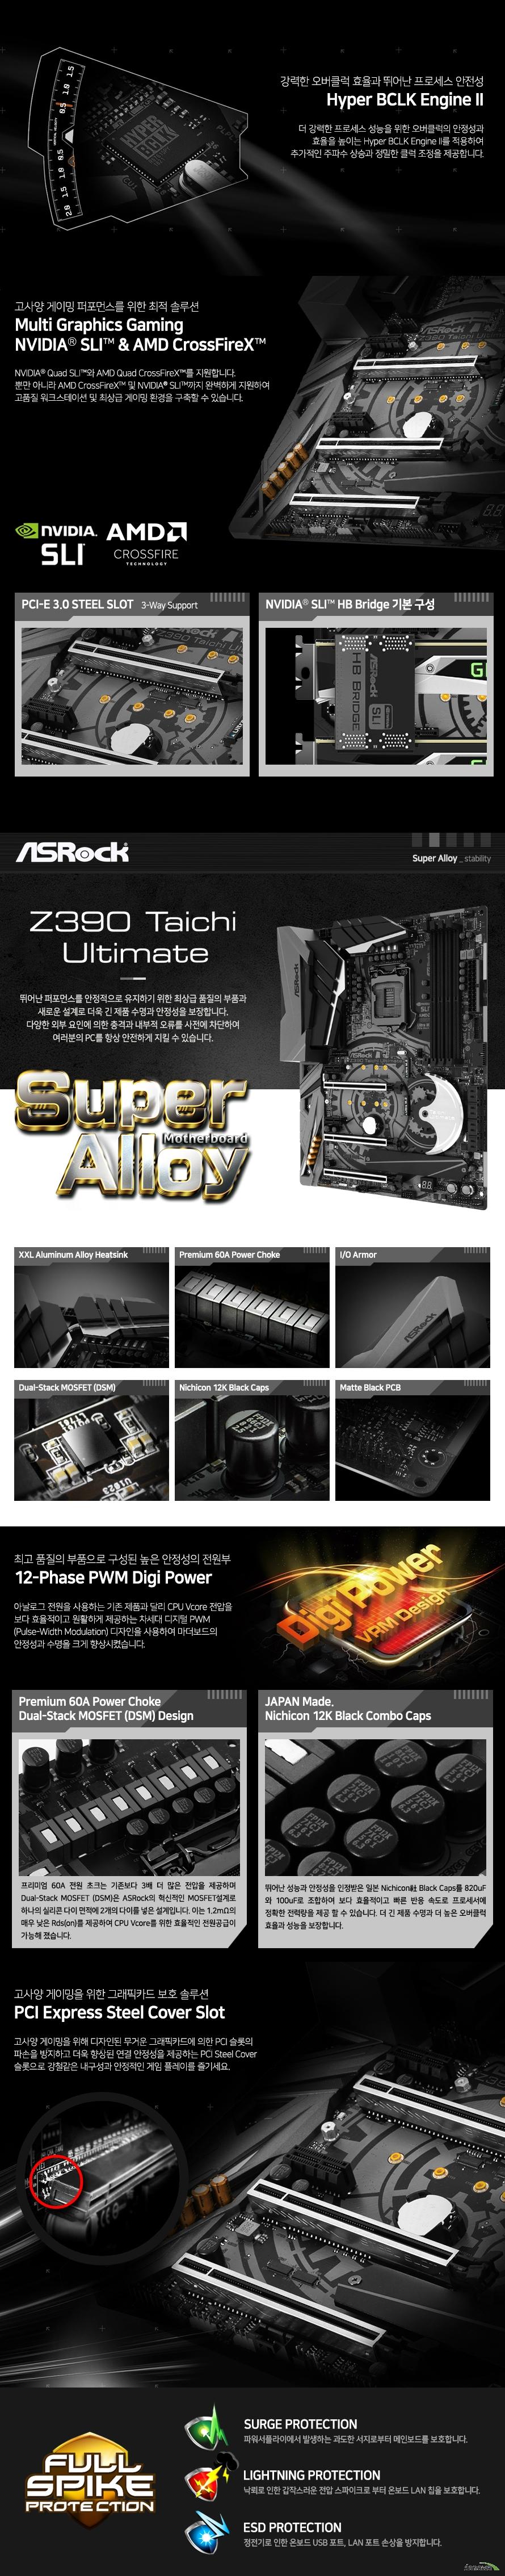 ASRock  Z390 TAICHI ULTIMATE 디앤디컴